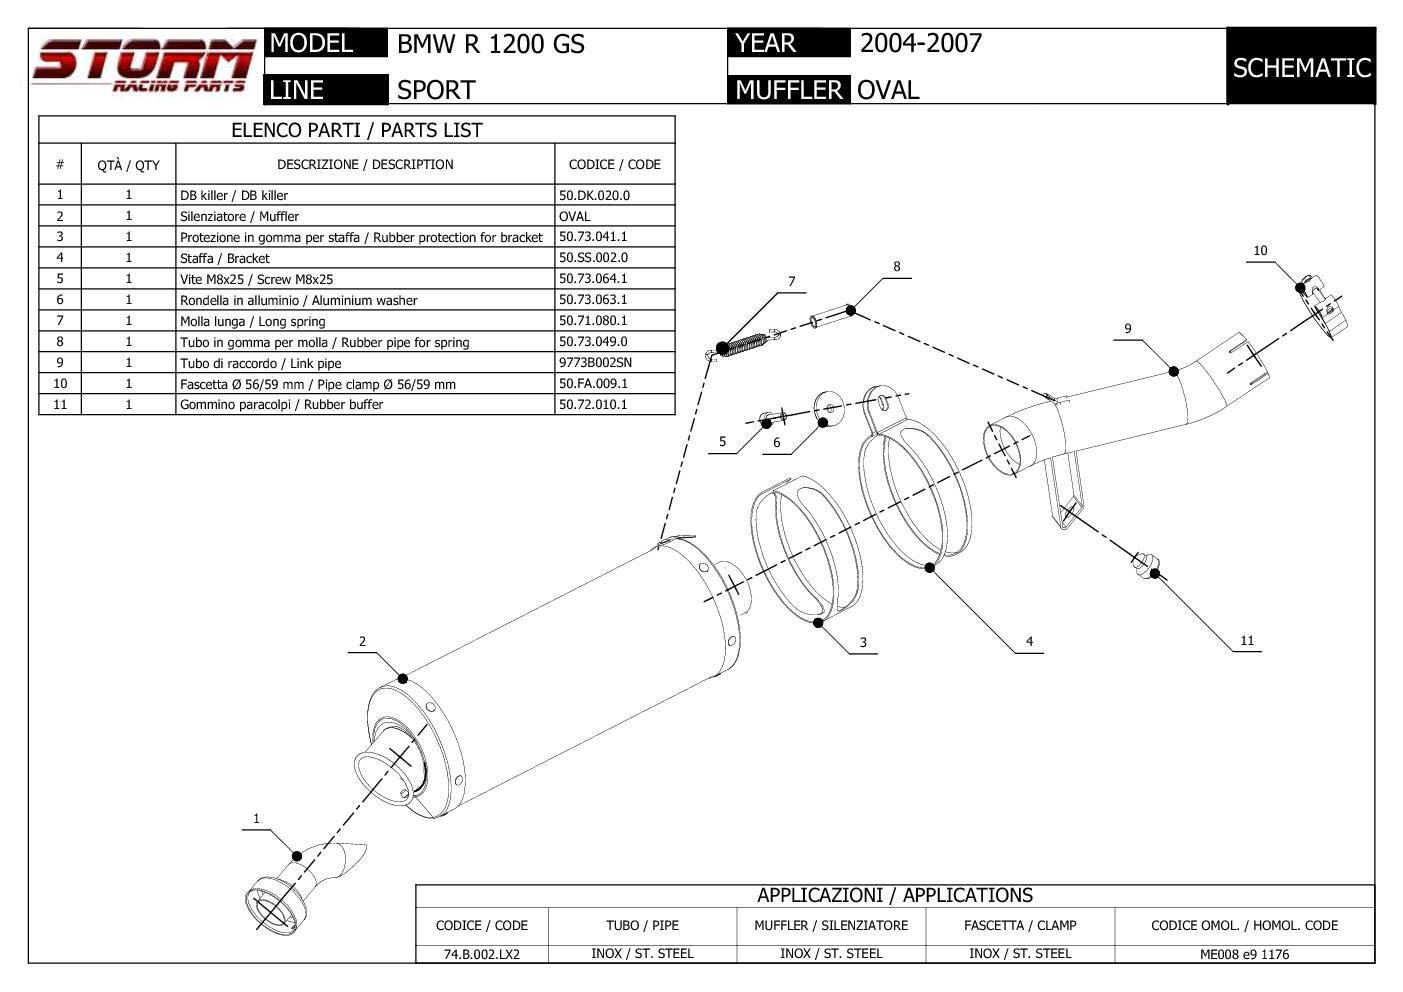 74.B.002.LX2 Auspuff Storm by Mivv Schalldampfer Oval Stahl fur R 1200 Gs 2005 05